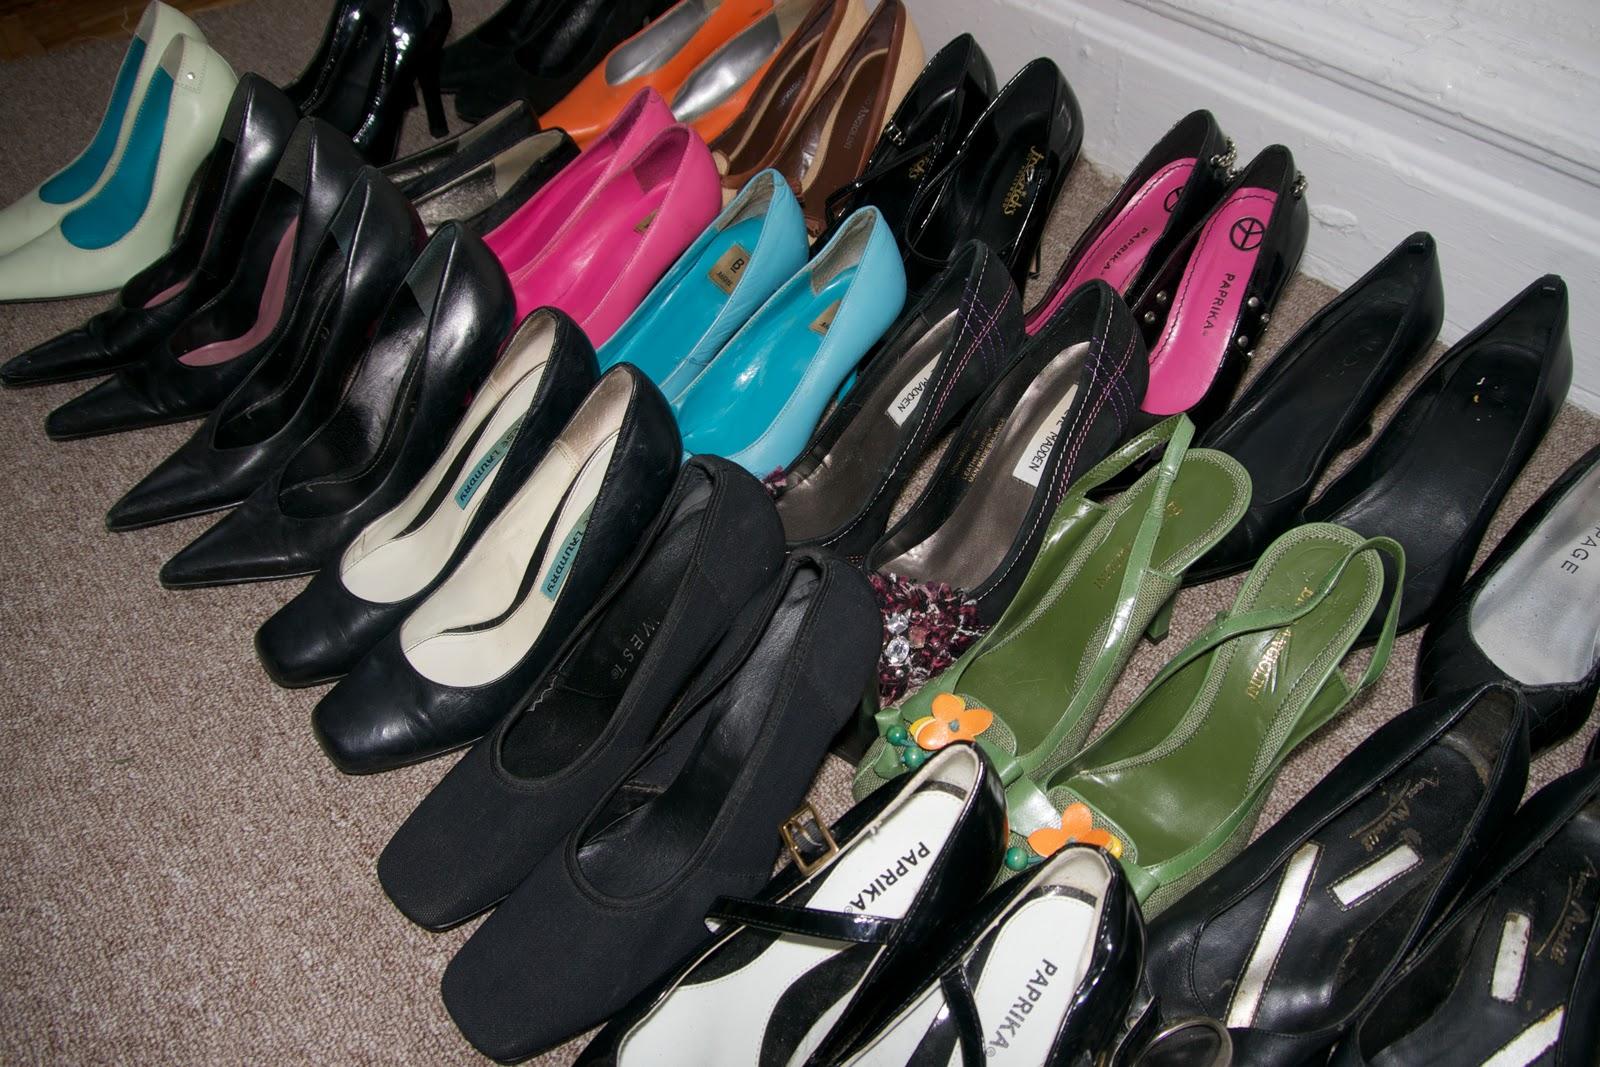 http://2.bp.blogspot.com/-b6GmeXq5kO4/Tvk4bqN82KI/AAAAAAAAAFk/HuCbDiQ8rBI/s1600/shoes_heels2++244.jpg